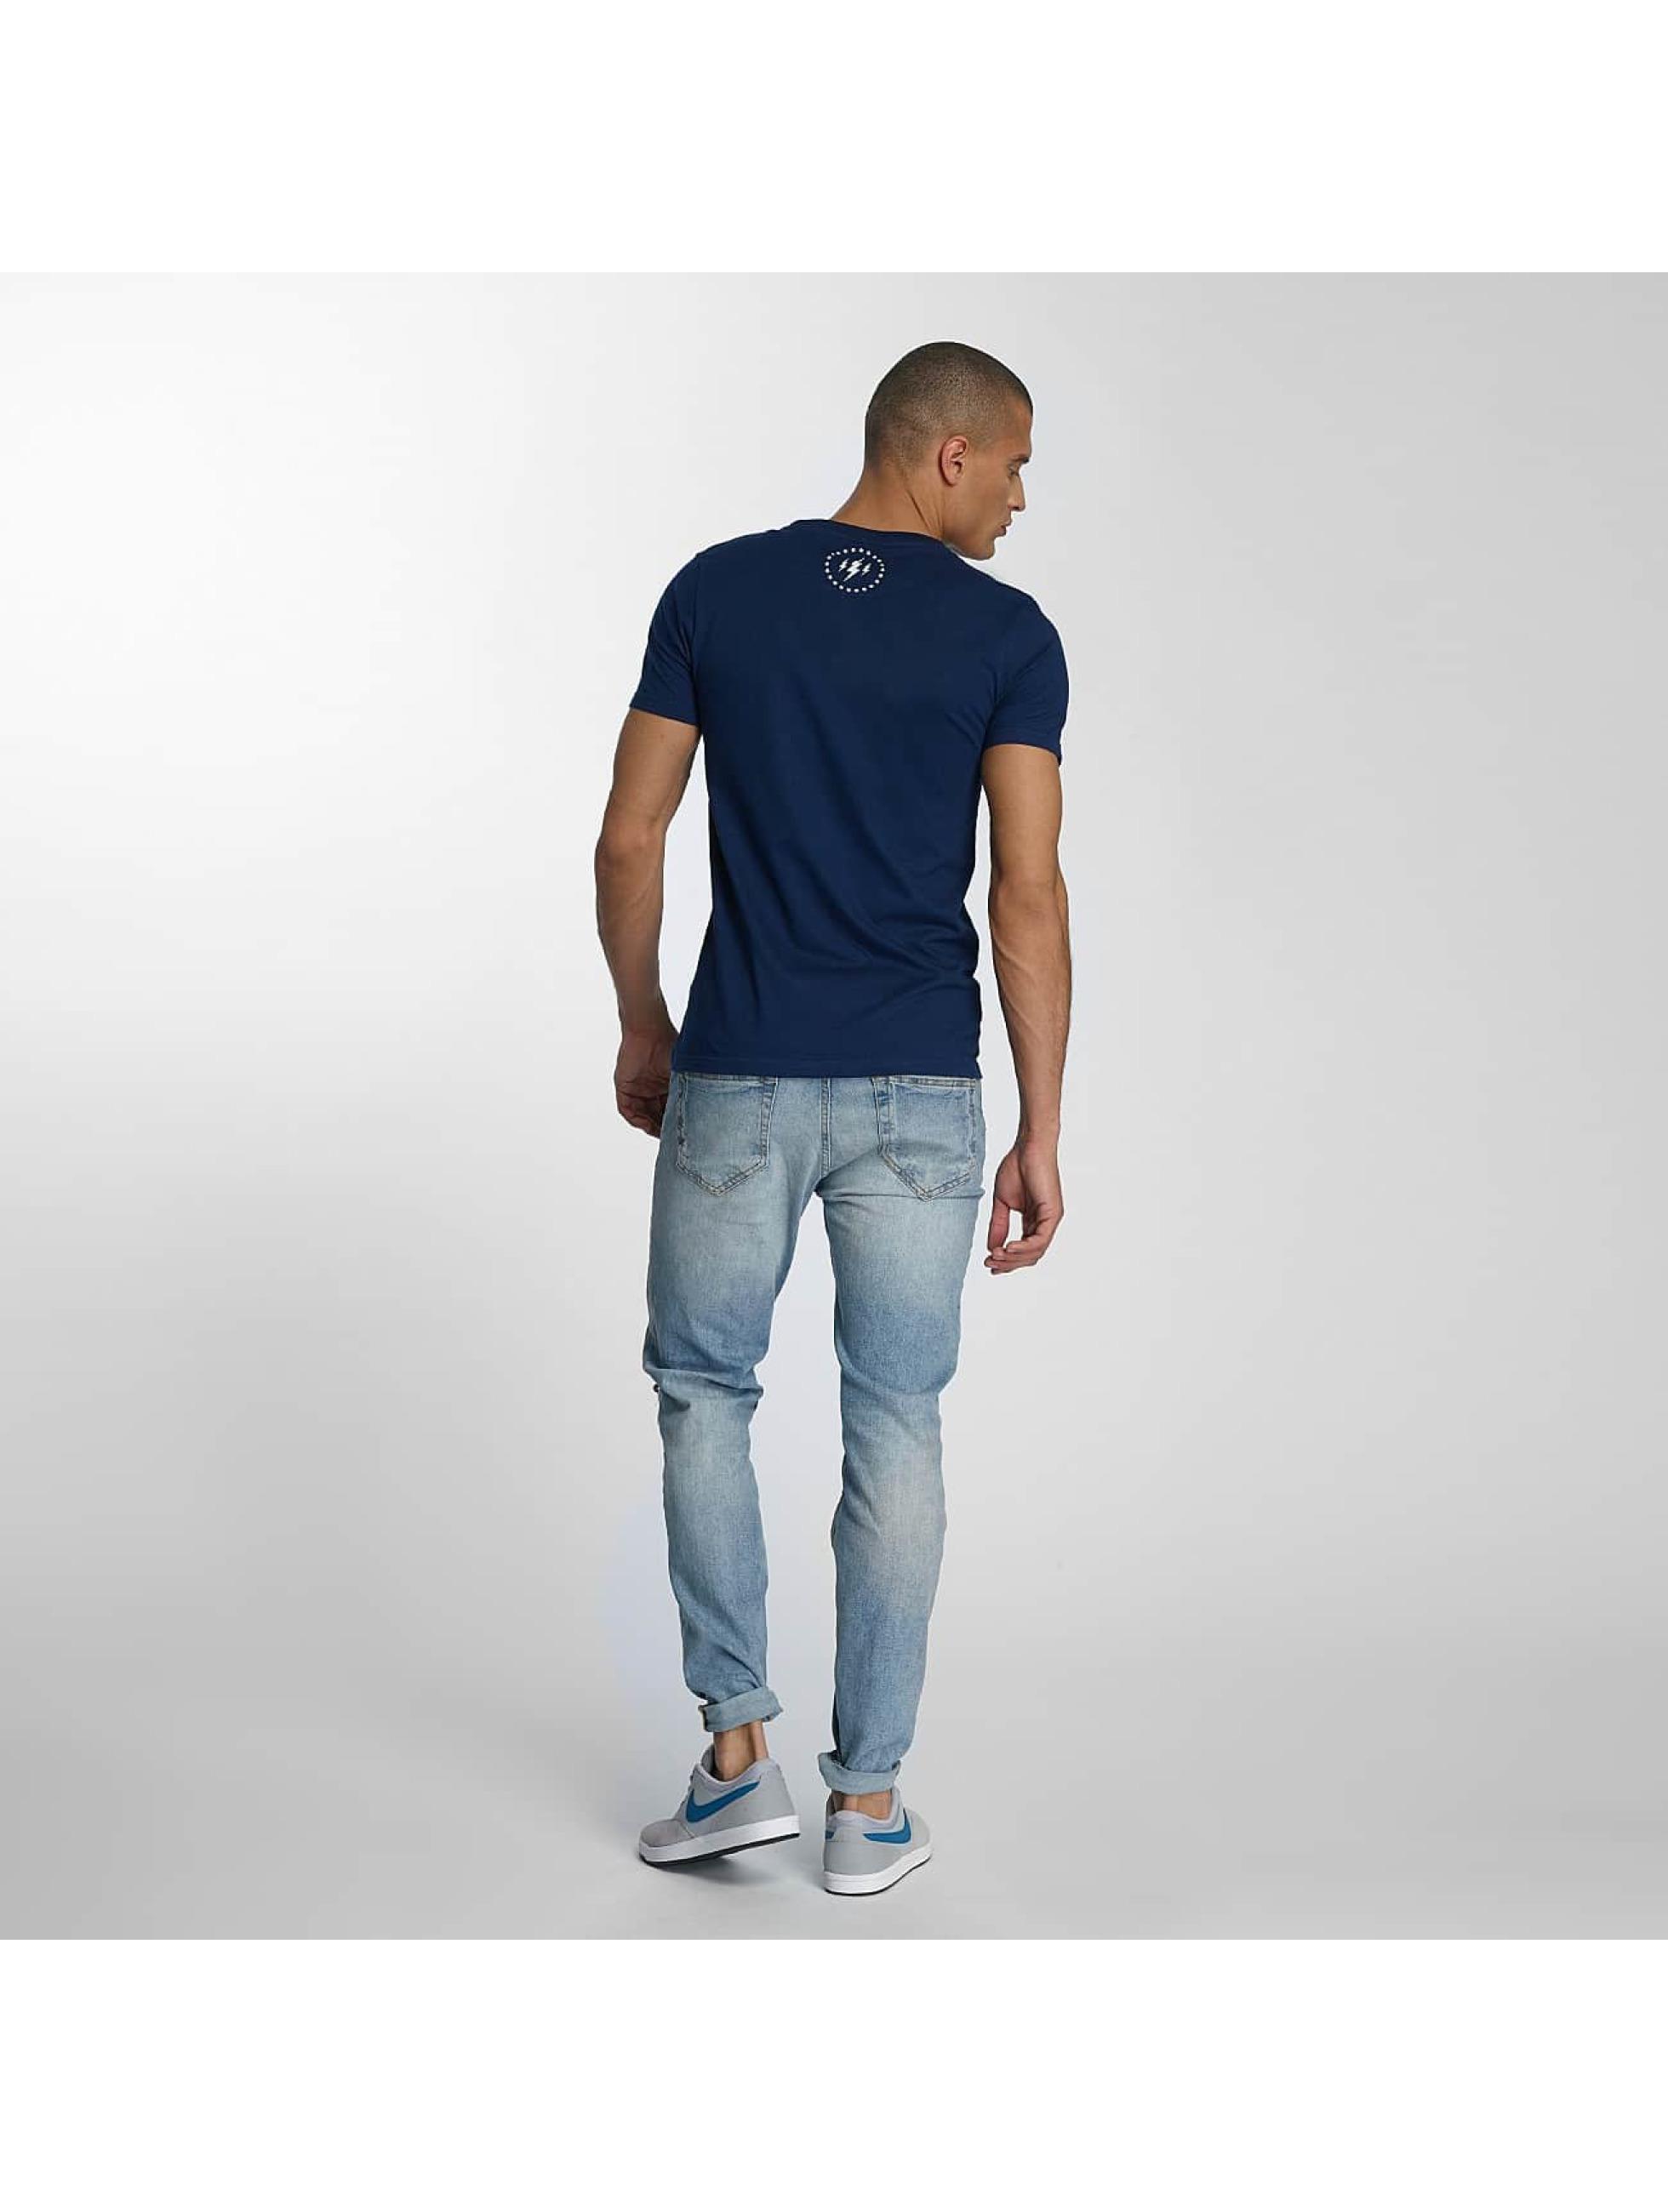 TrueSpin T-paidat 2 sininen